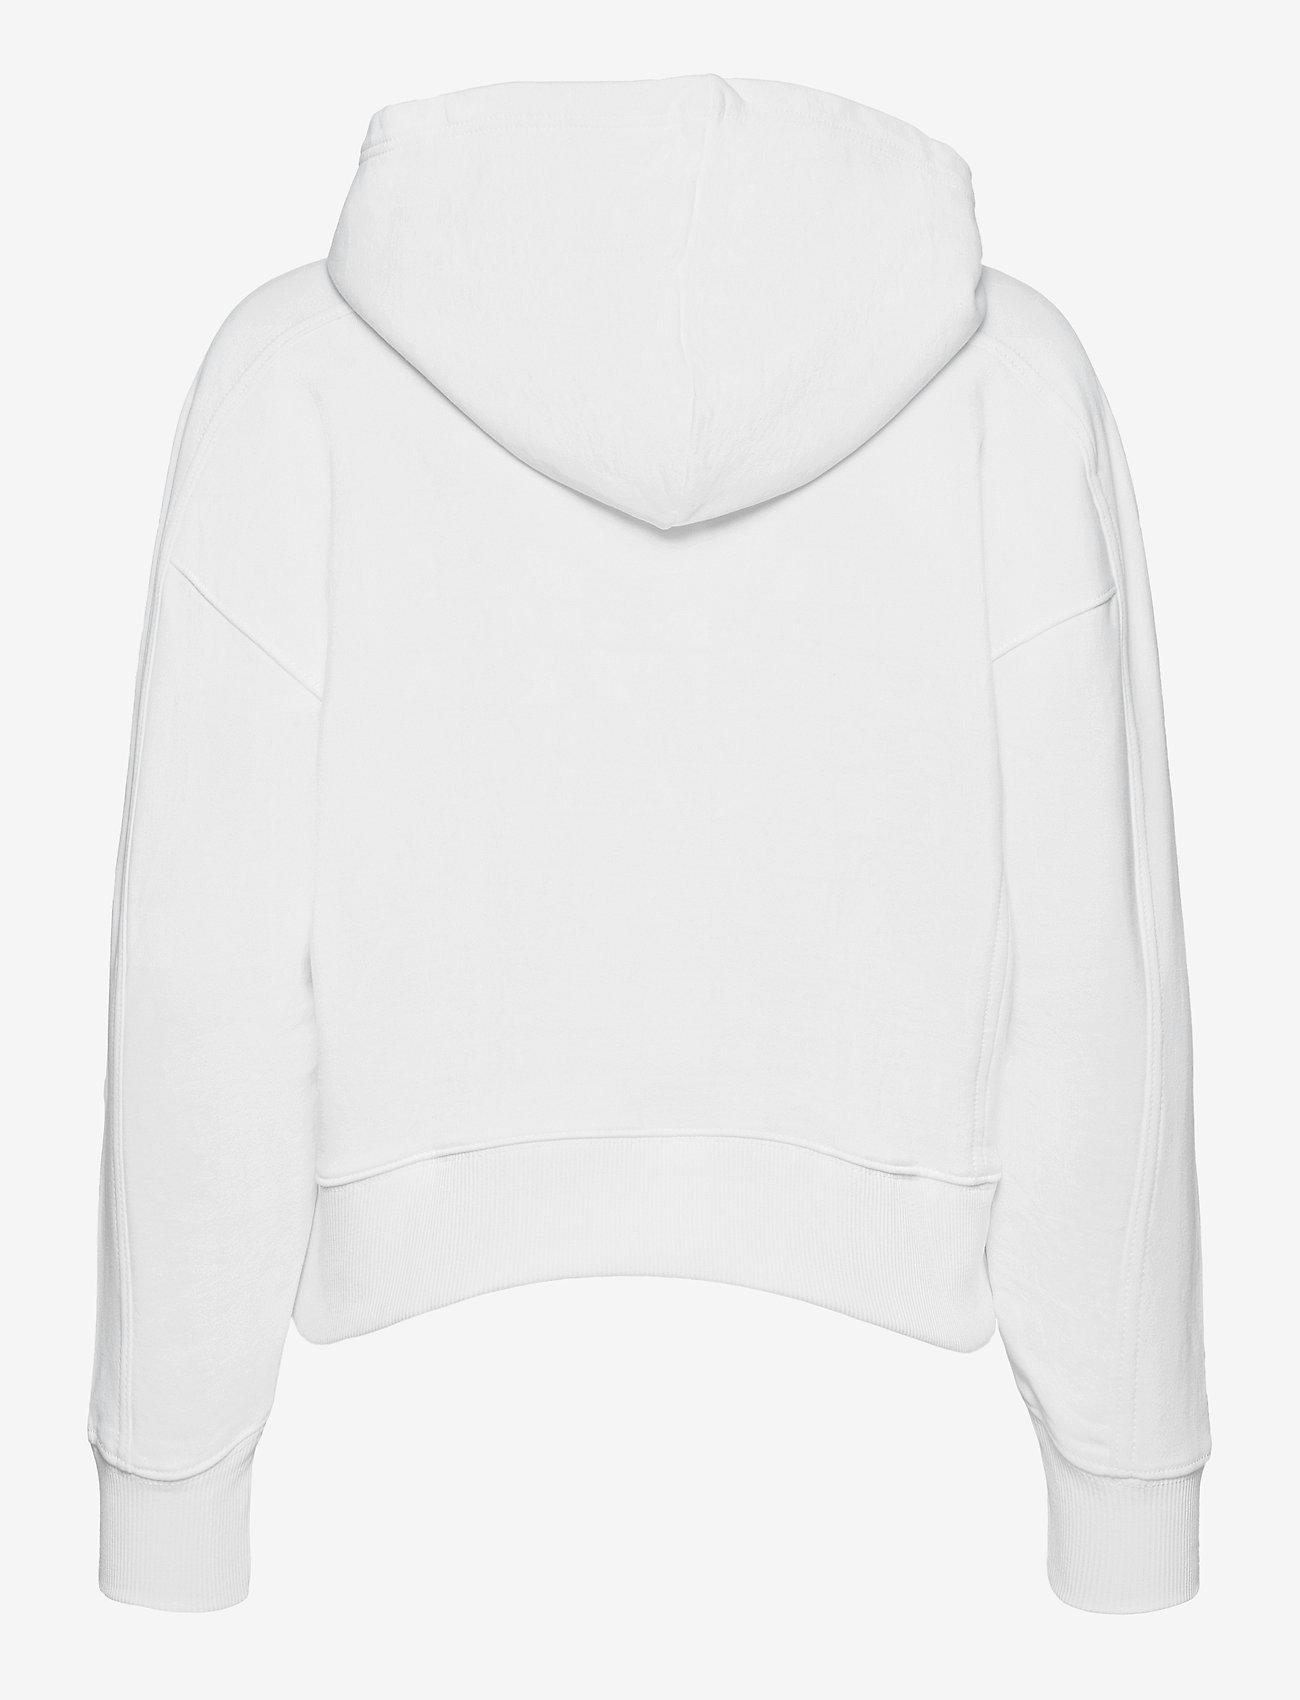 Calvin Klein Jeans - MICRO BRANDING HOODIE - hettegensere - bright white - 1